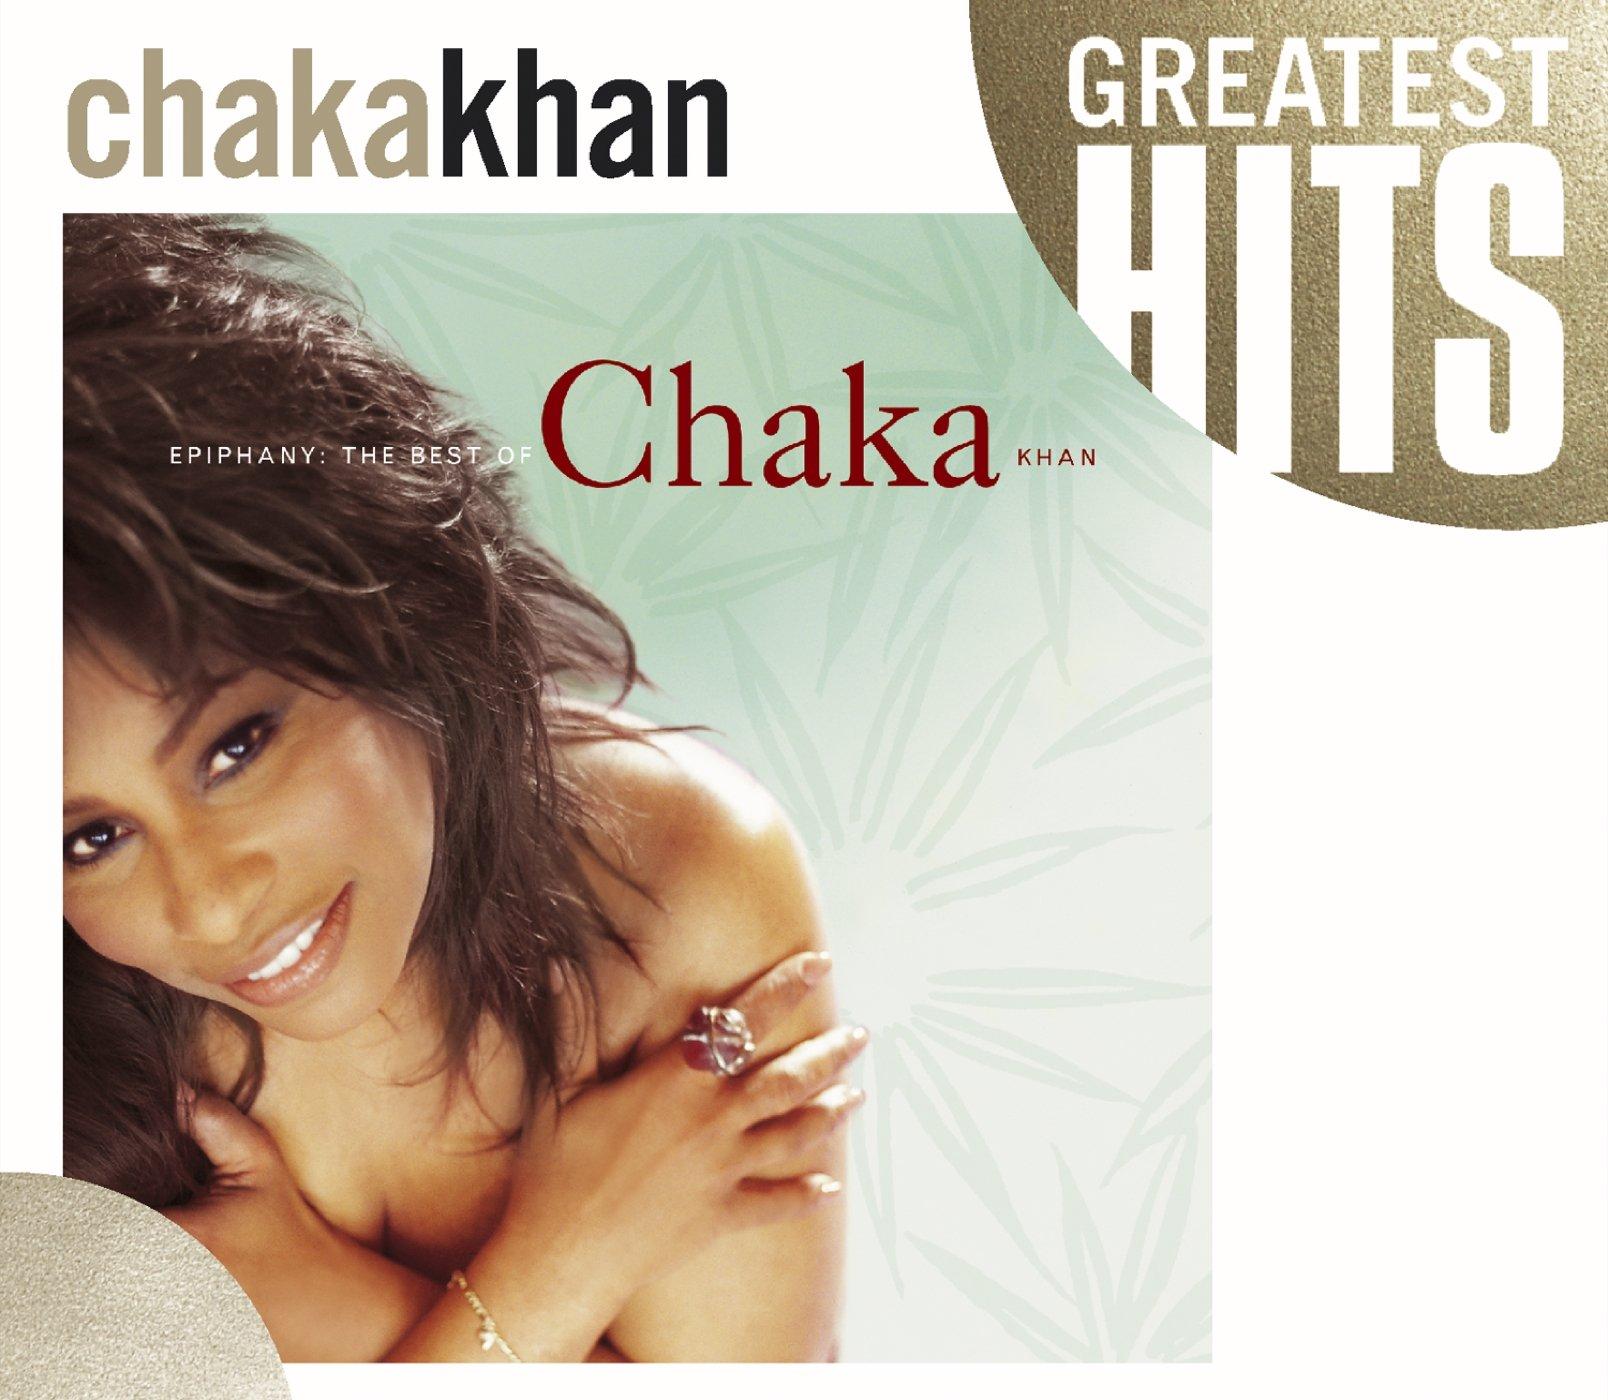 The Best Of Chaka Khan (Rpkg) by KHAN,CHAKA